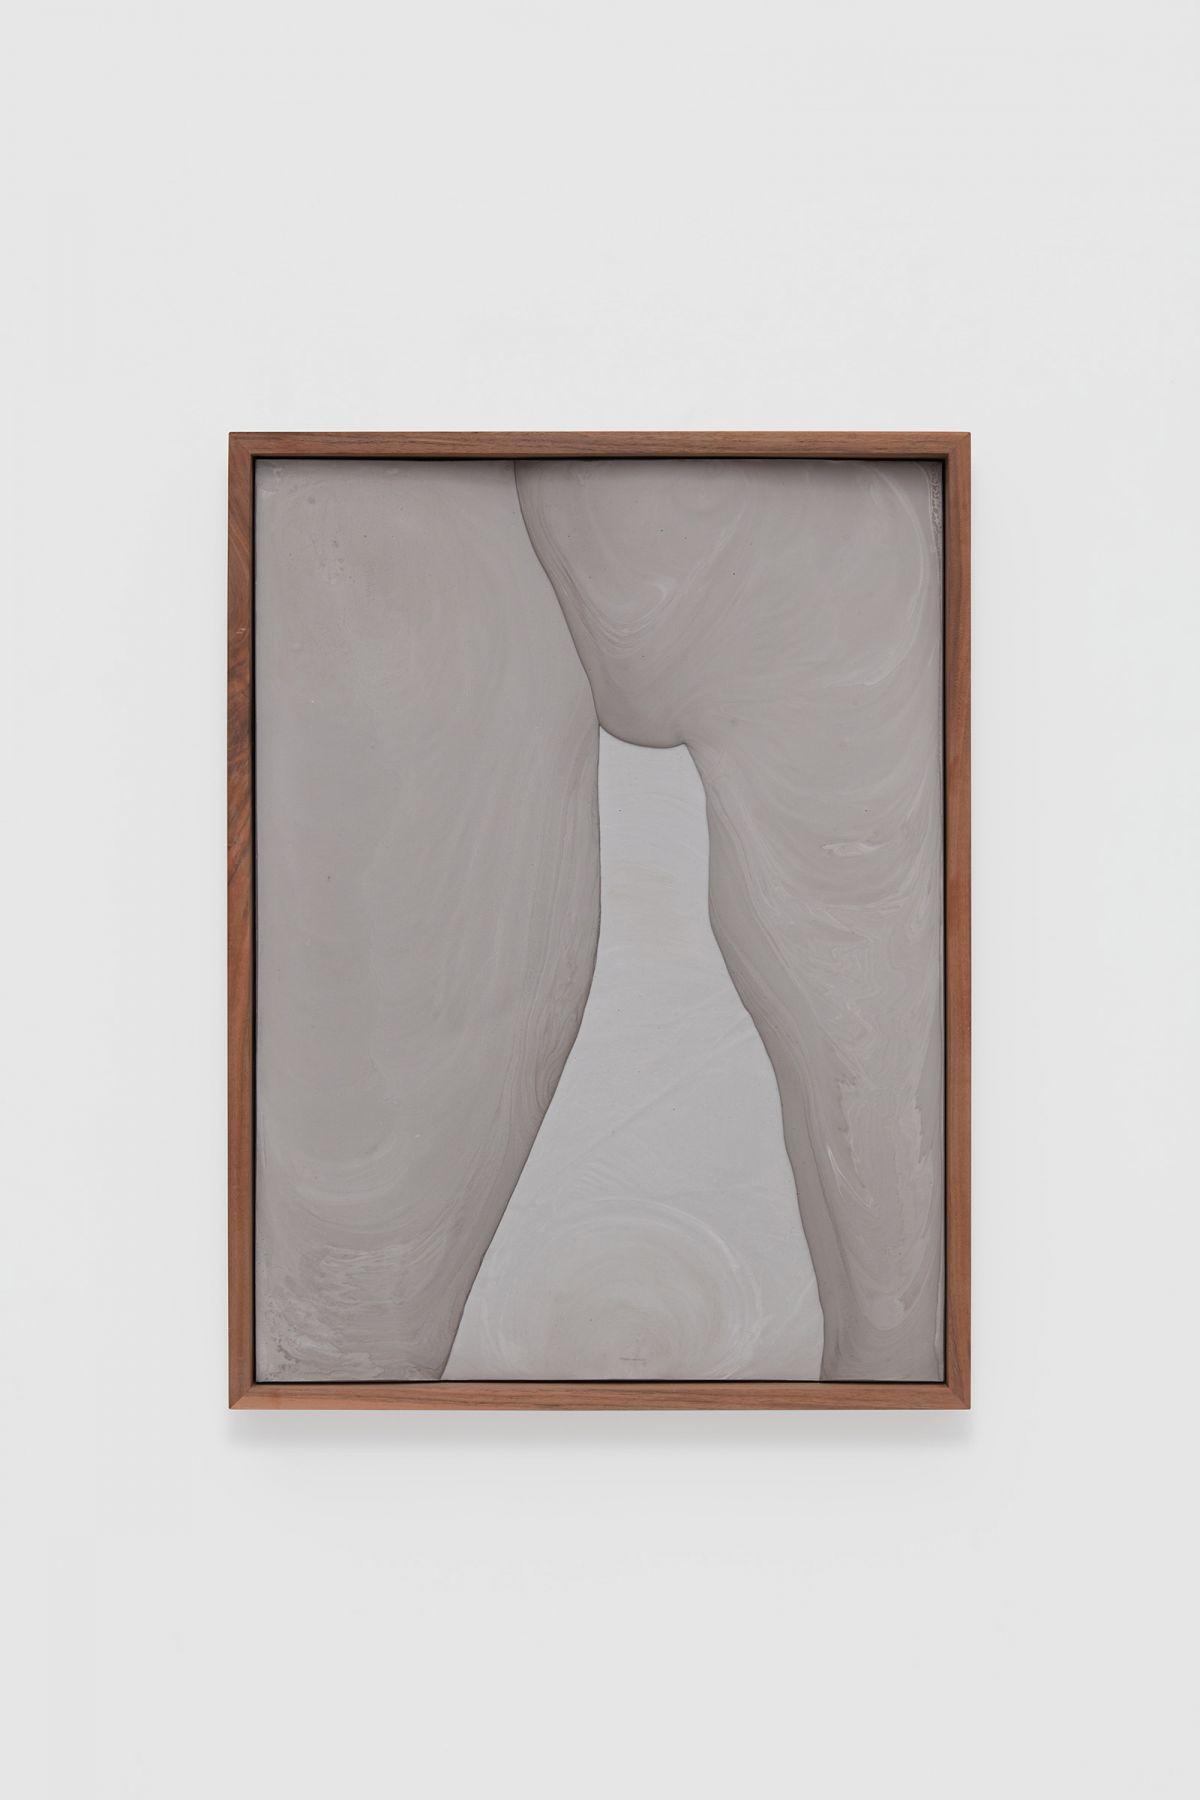 a purplish-grey plaster artwork by contemporary artist anthony pearson